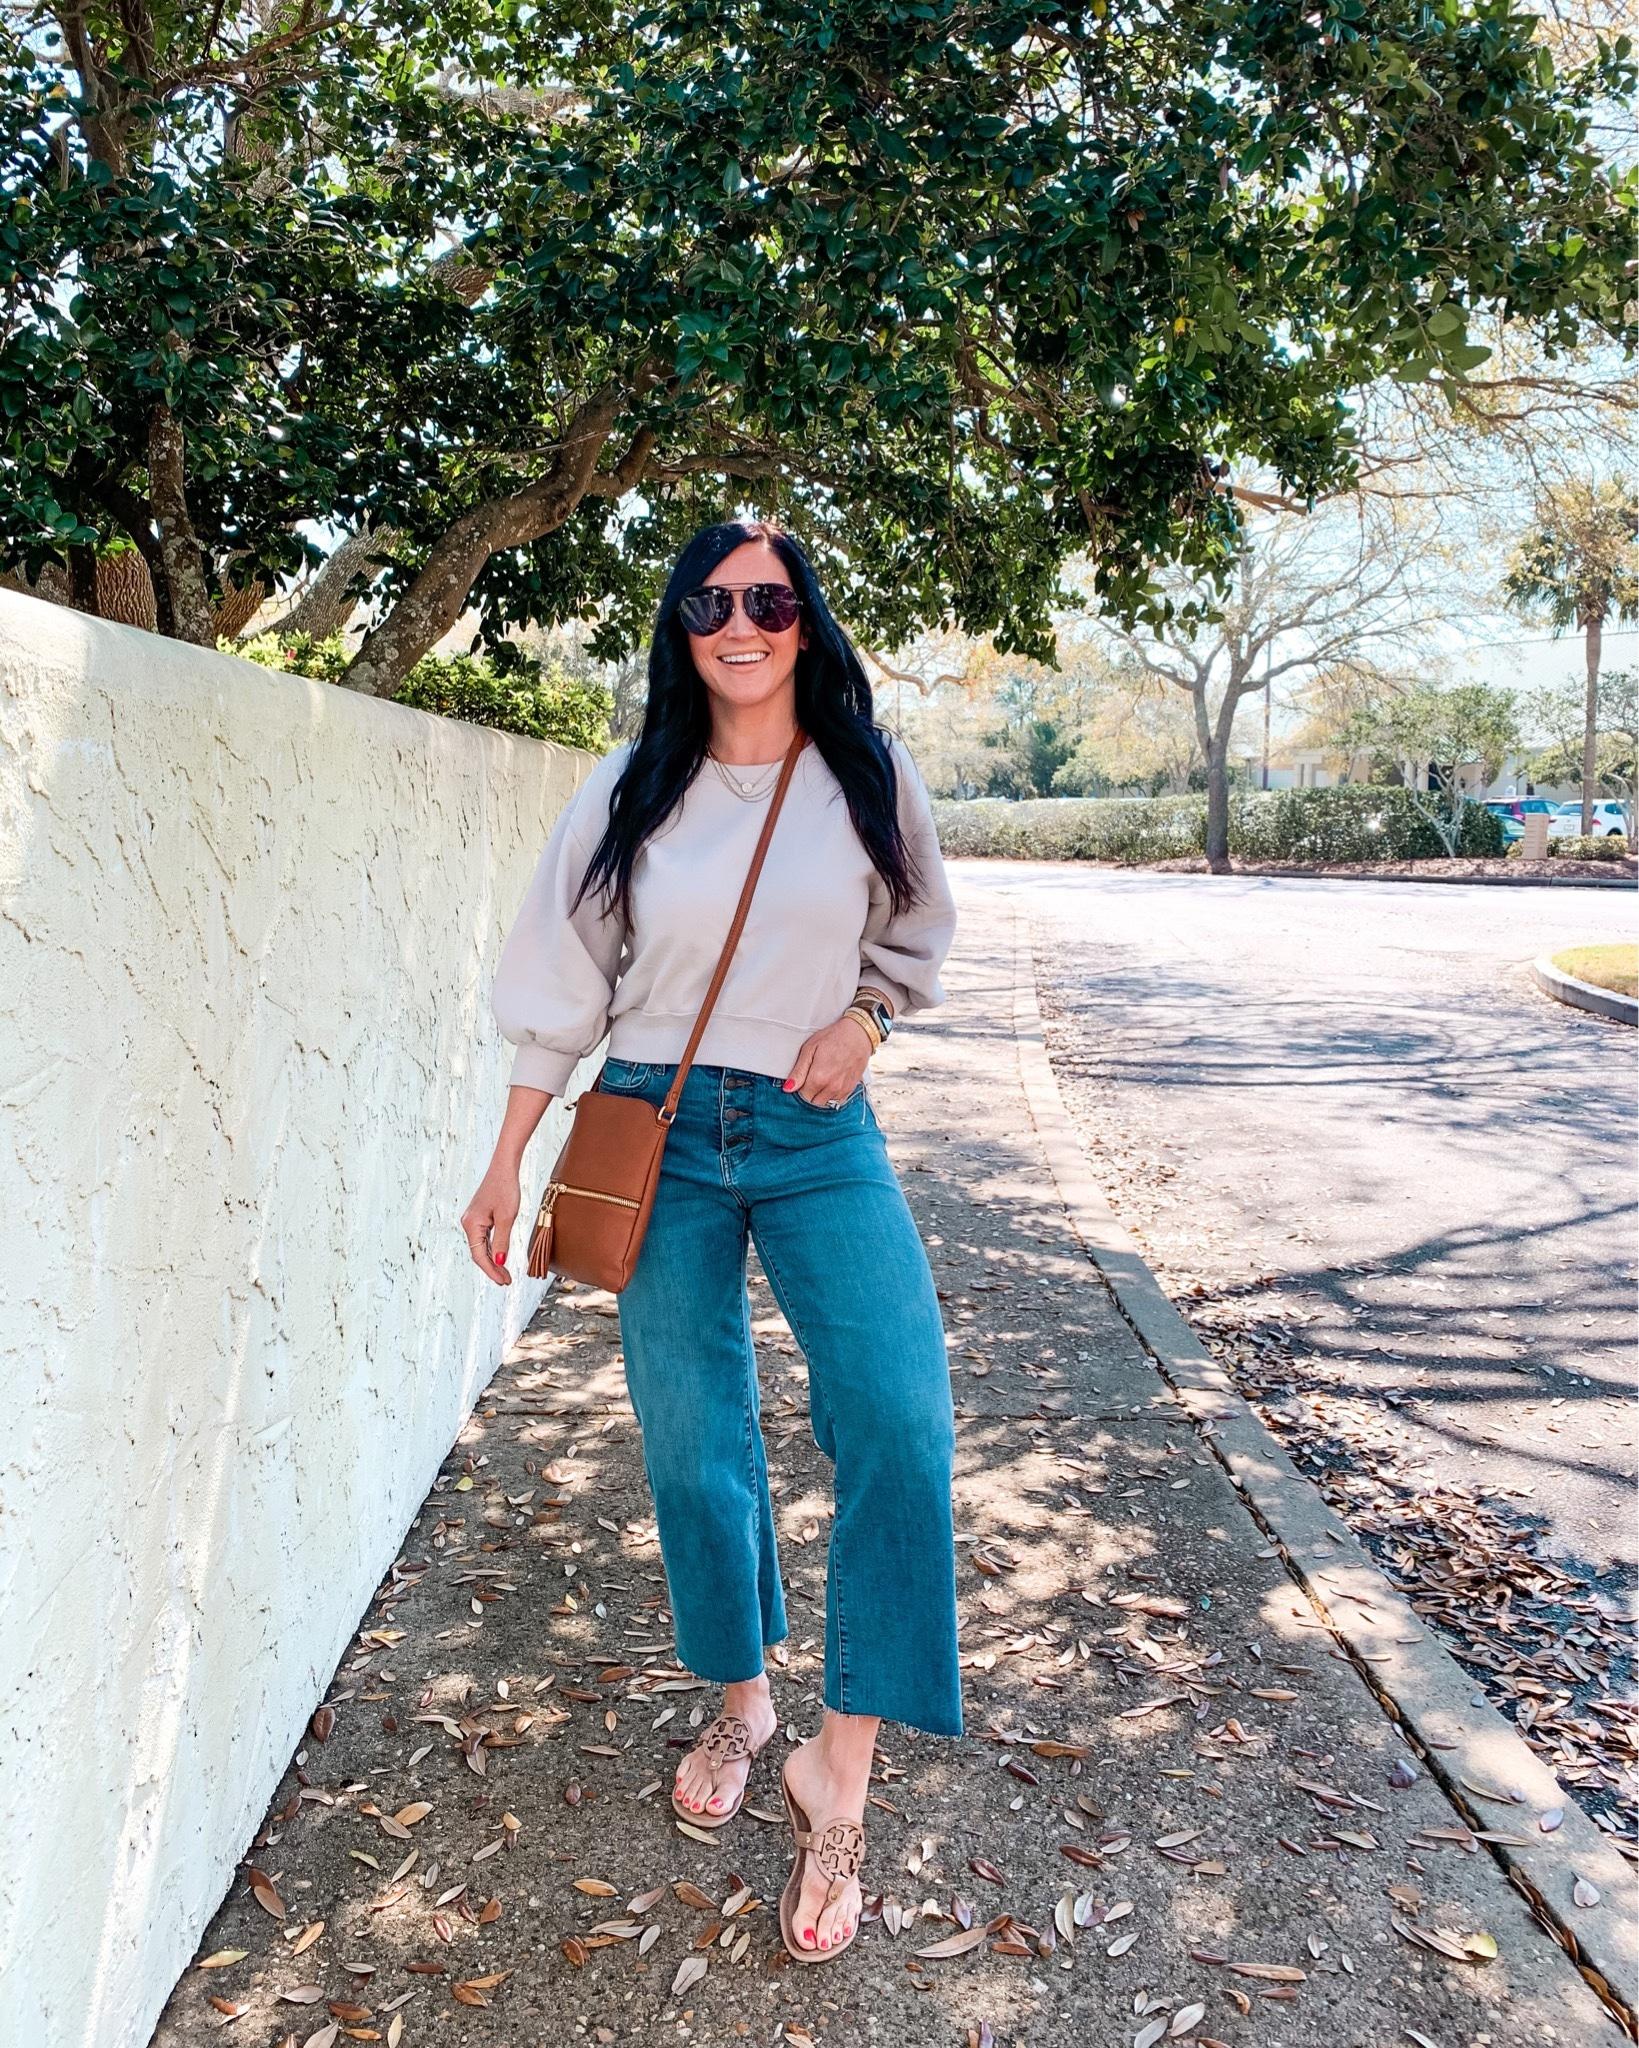 30A vacation, Stilettos and Diapers, Molly Wey, Blue Mountain Beach Florida